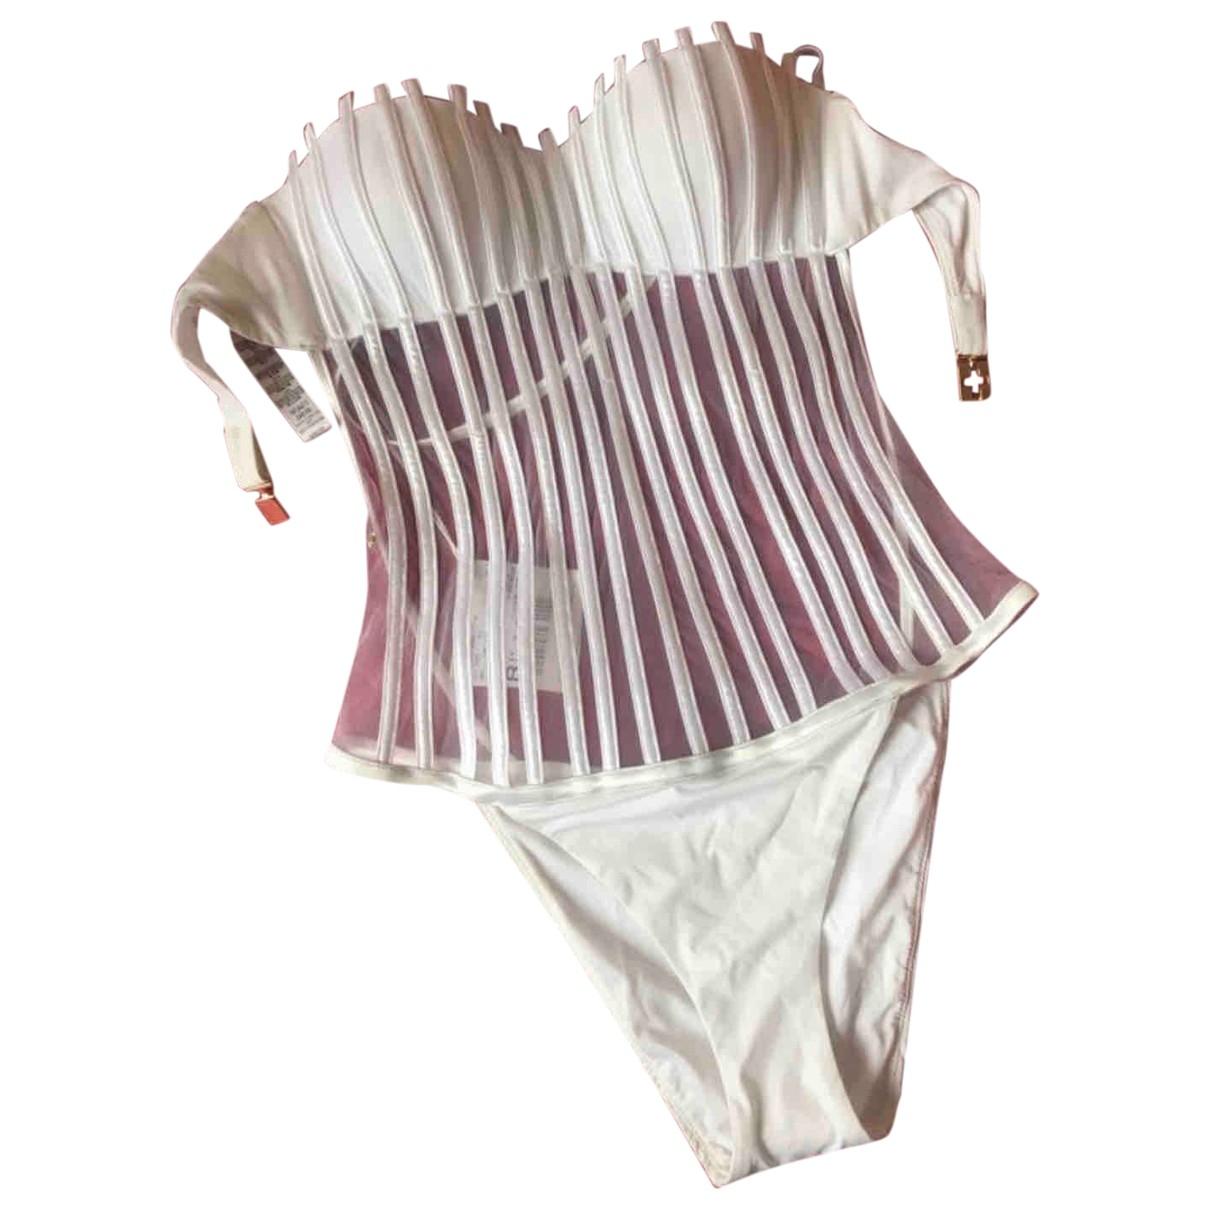 La Perla \N Badeanzug in  Weiss Polyester